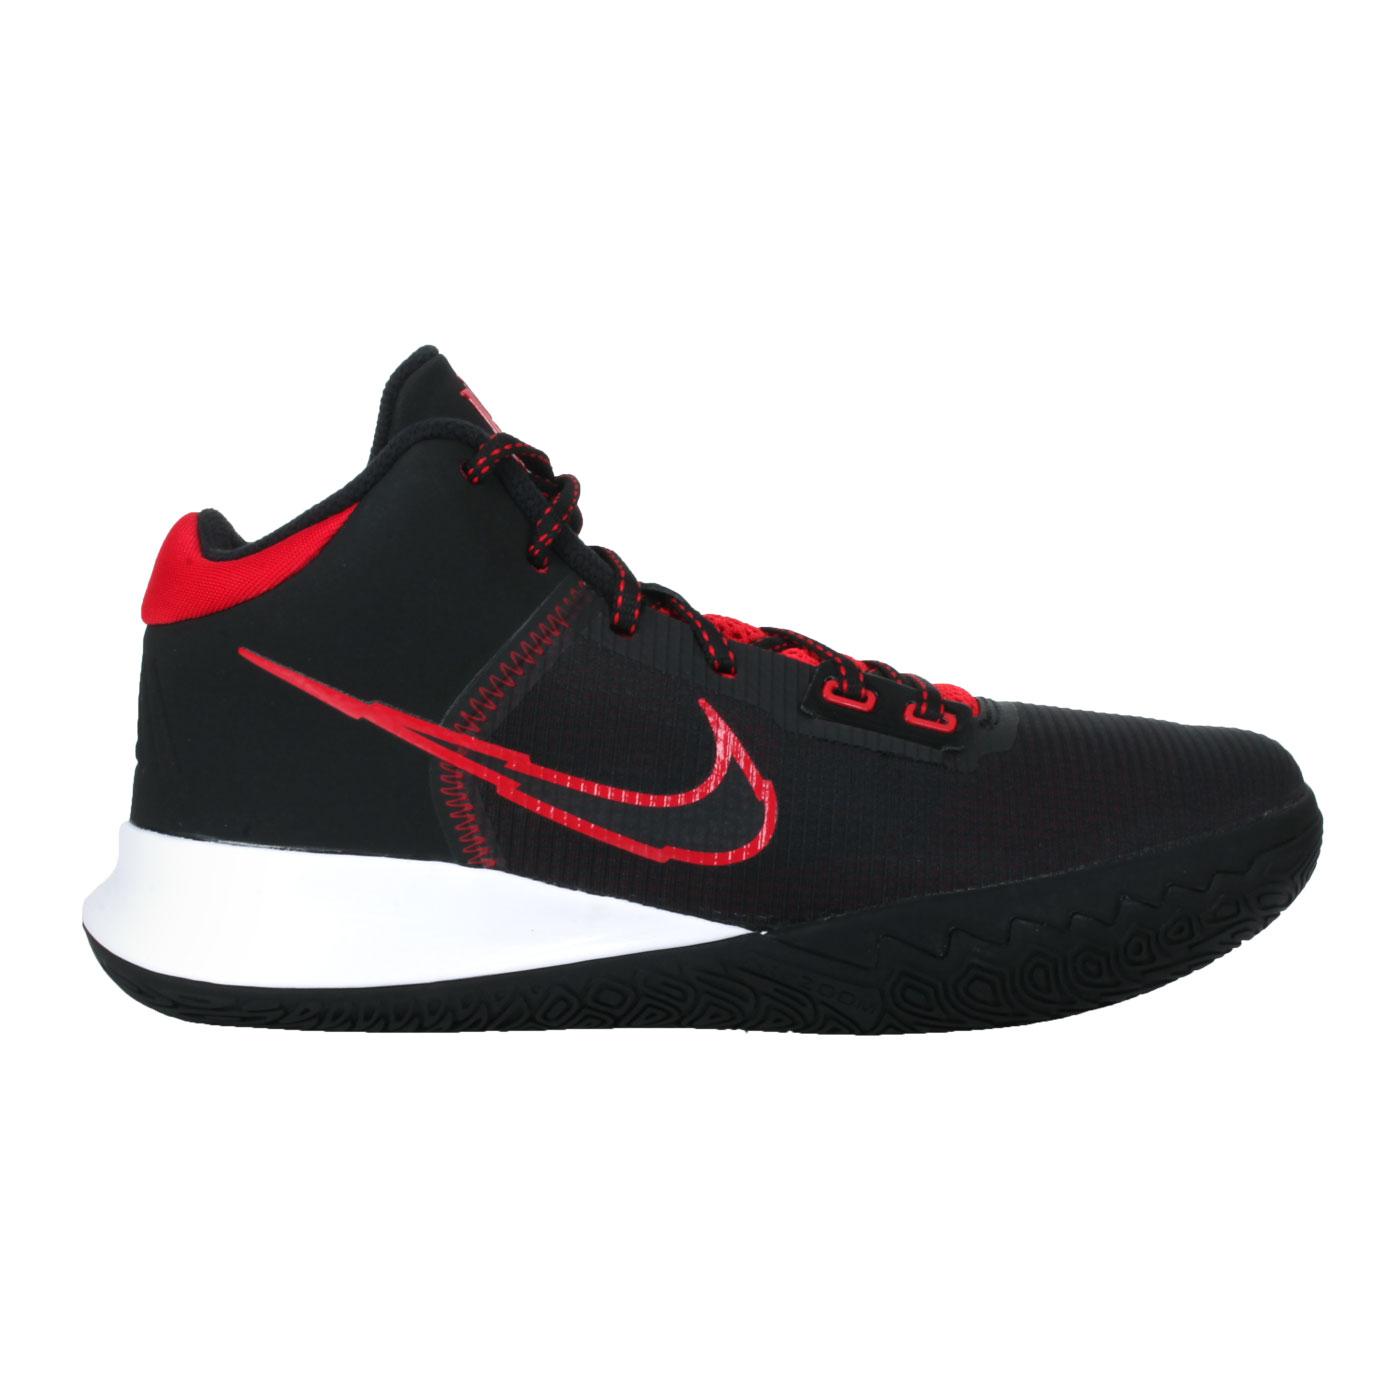 NIKE 男款籃球鞋  @KYRIE FLYTRAP IV EP@CT1973004 - 黑紅